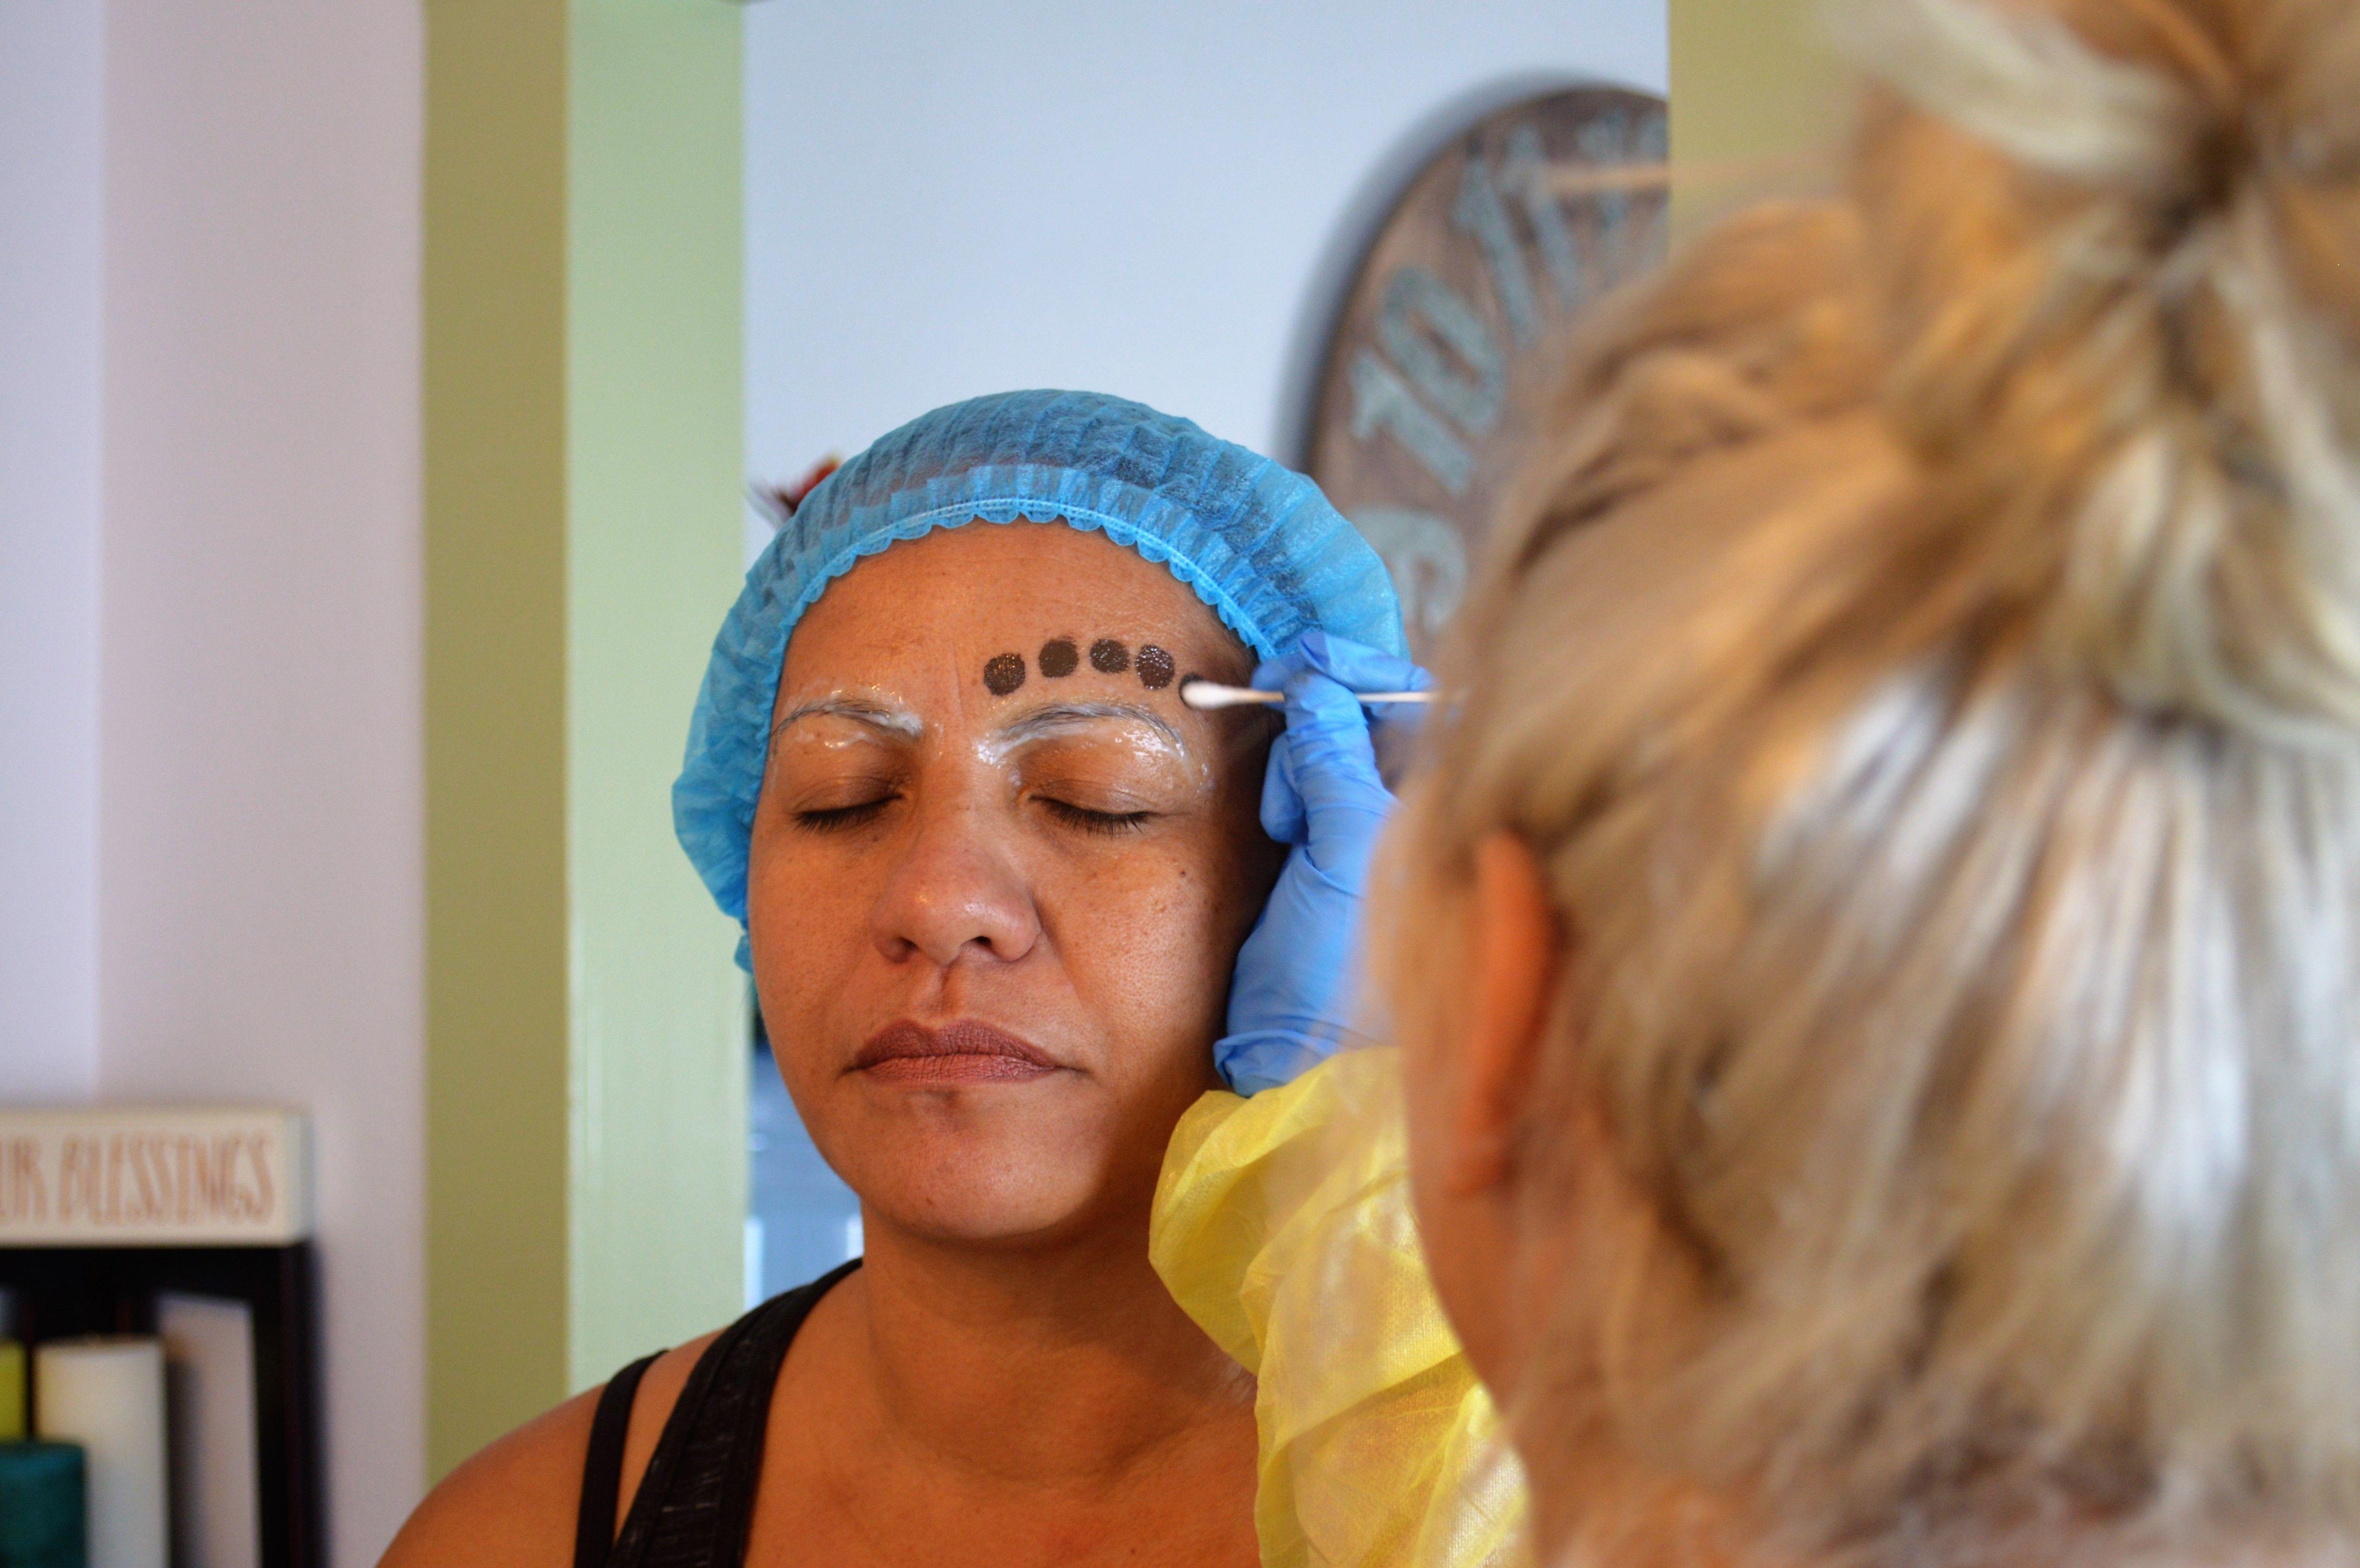 Permanent Makeup School Maui, Hawaii in 2020 Permanent